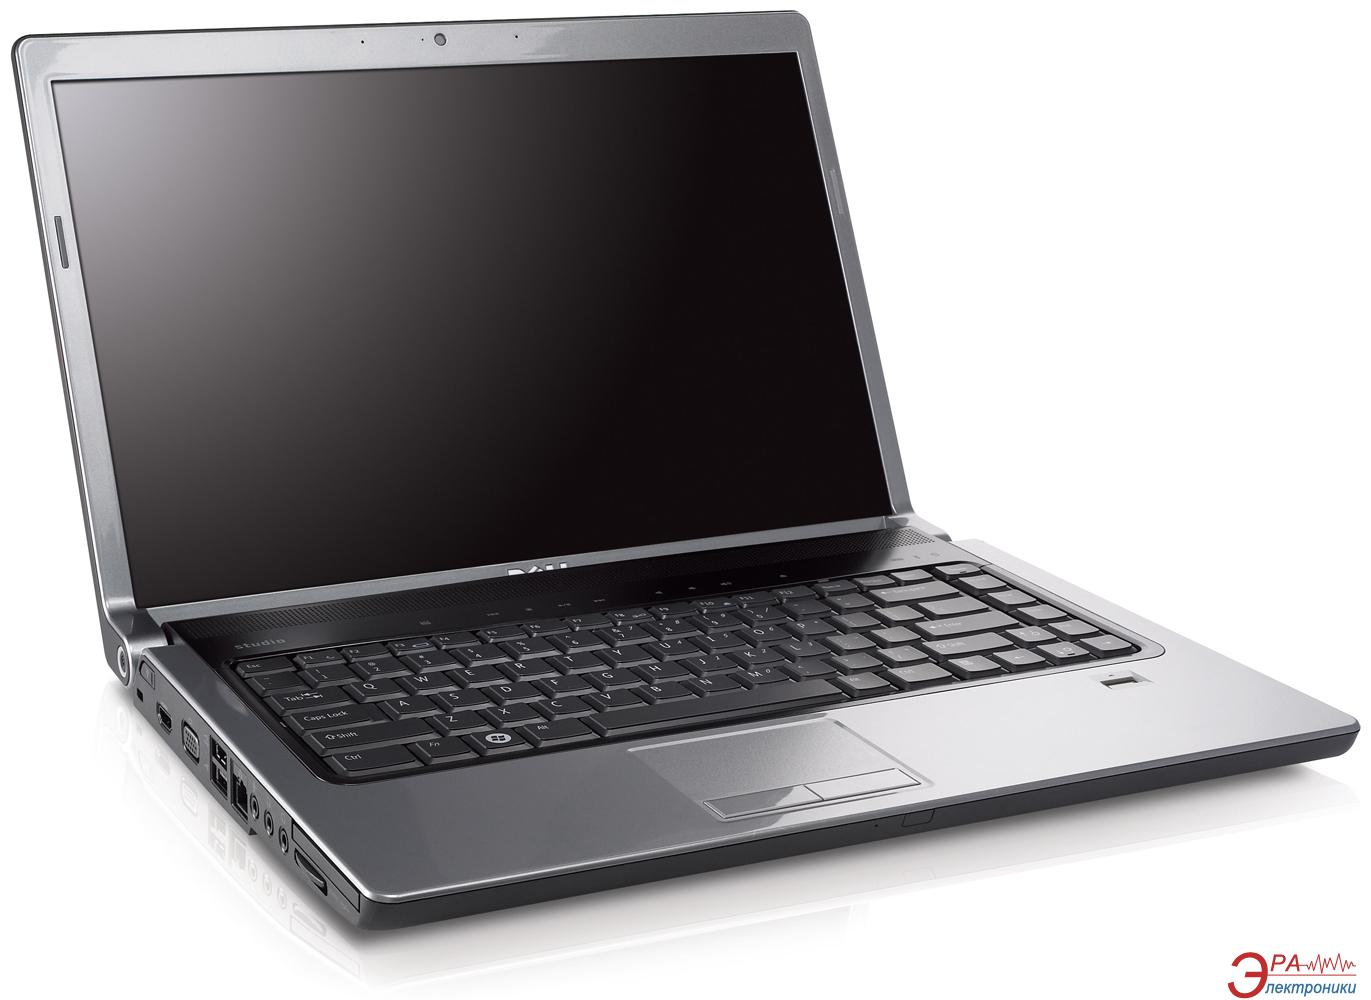 Ноутбук Dell Studio 1558 (1558H350D3C320WB7Hblack) Black 15,6